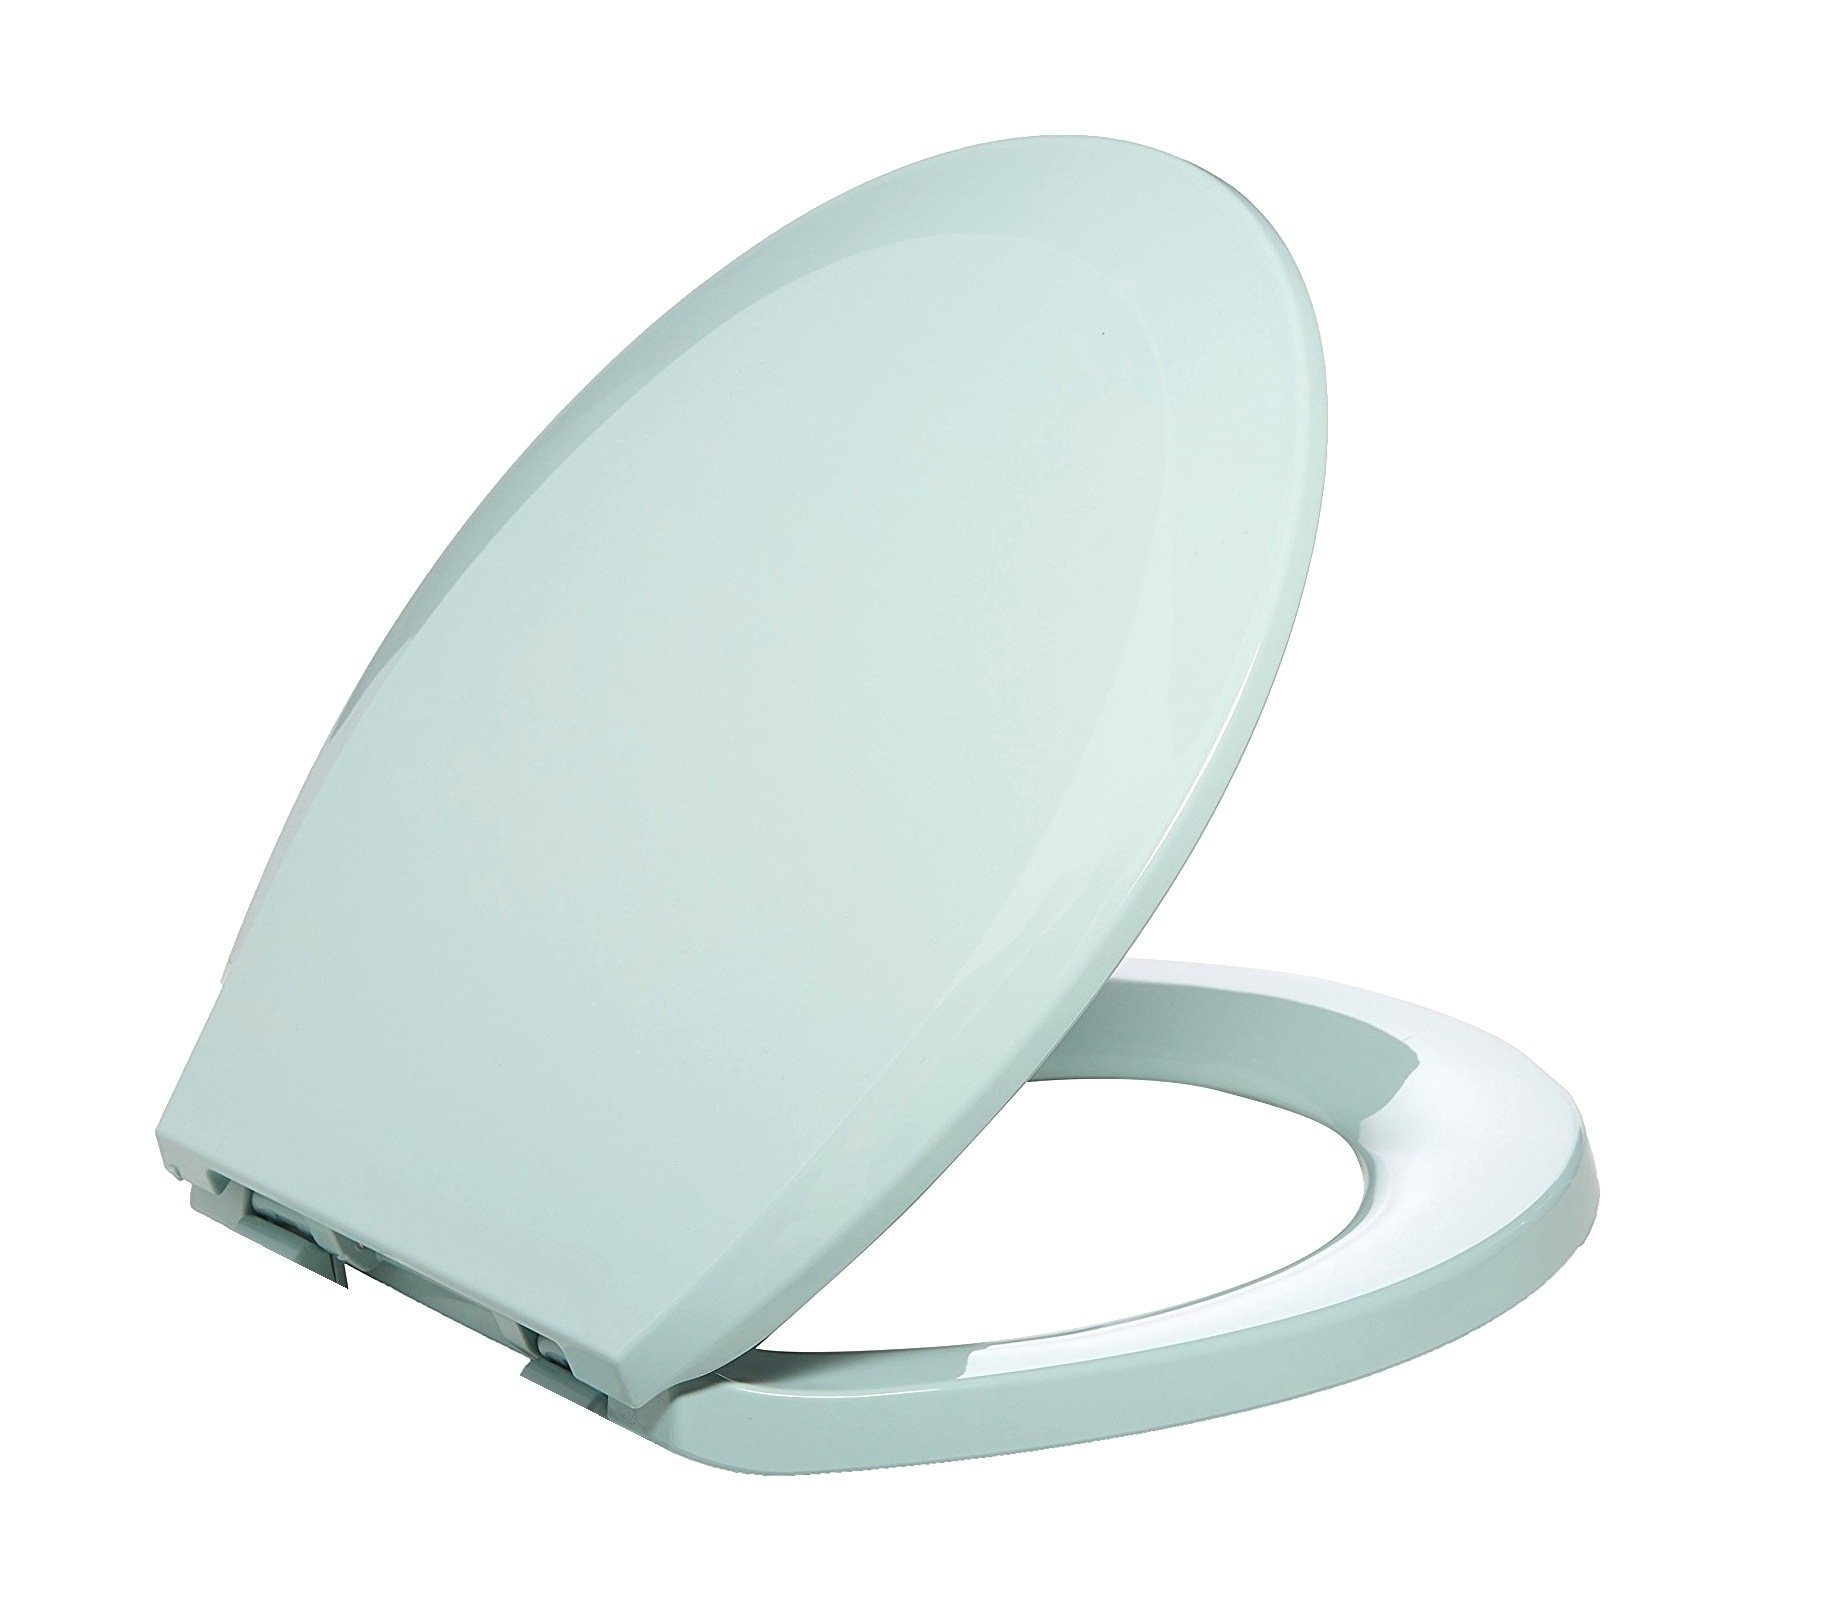 AAI European Easy Move Plastic Wall Hung Toilet Commode Seat Cover, Standard, Green (B07CHVBMYQ) Amazon Price History, Amazon Price Tracker